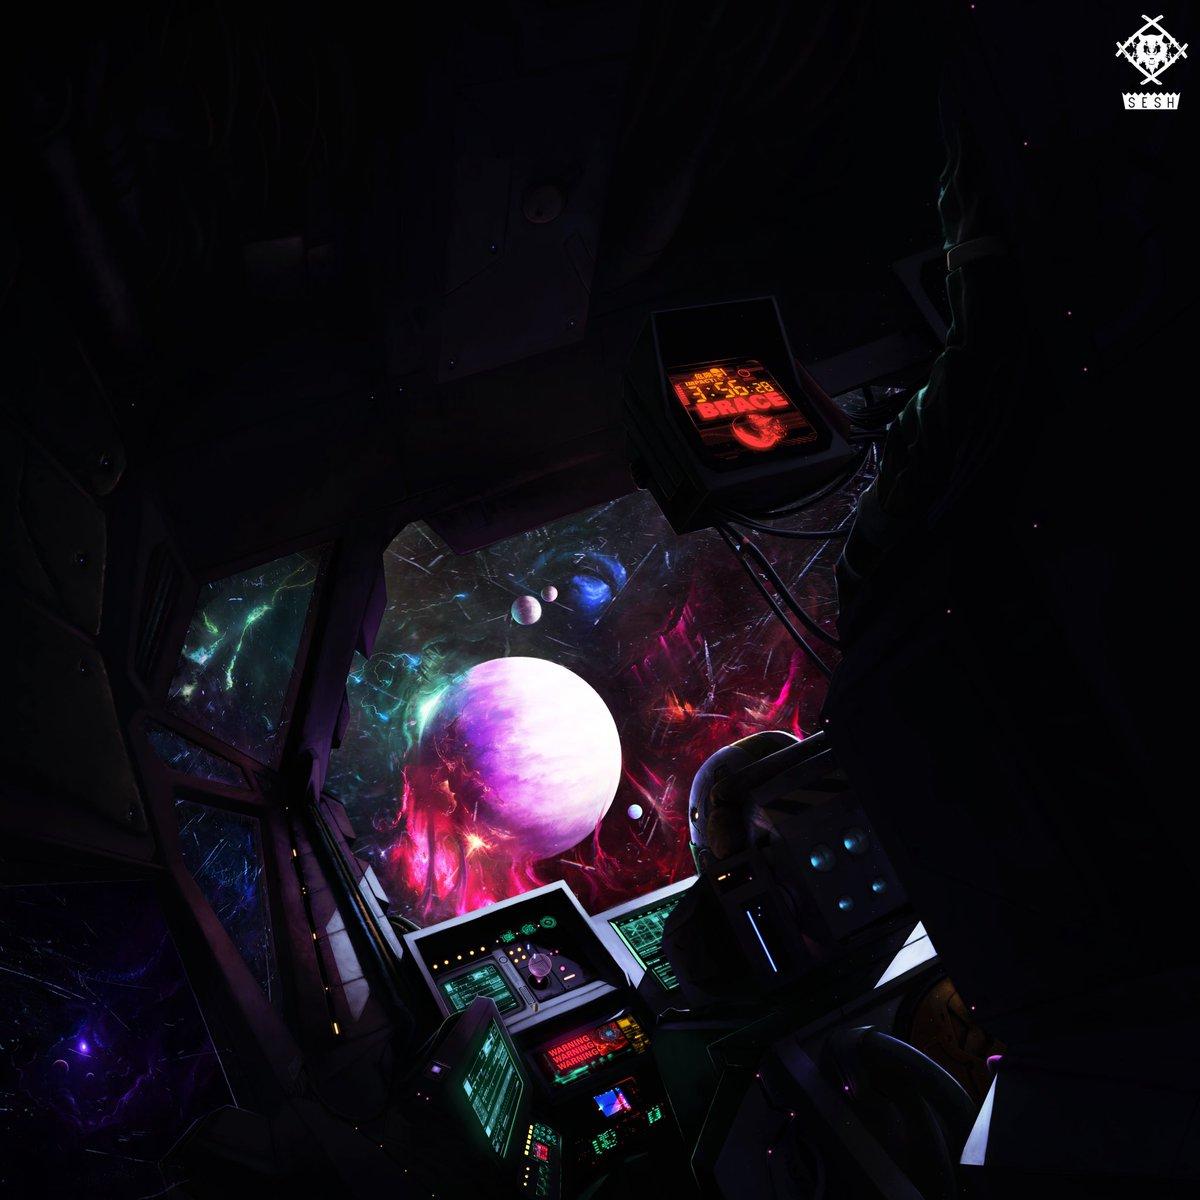 XAVIER WULF & BONES - BRACE soundcloud.com/xavierwulf/set…